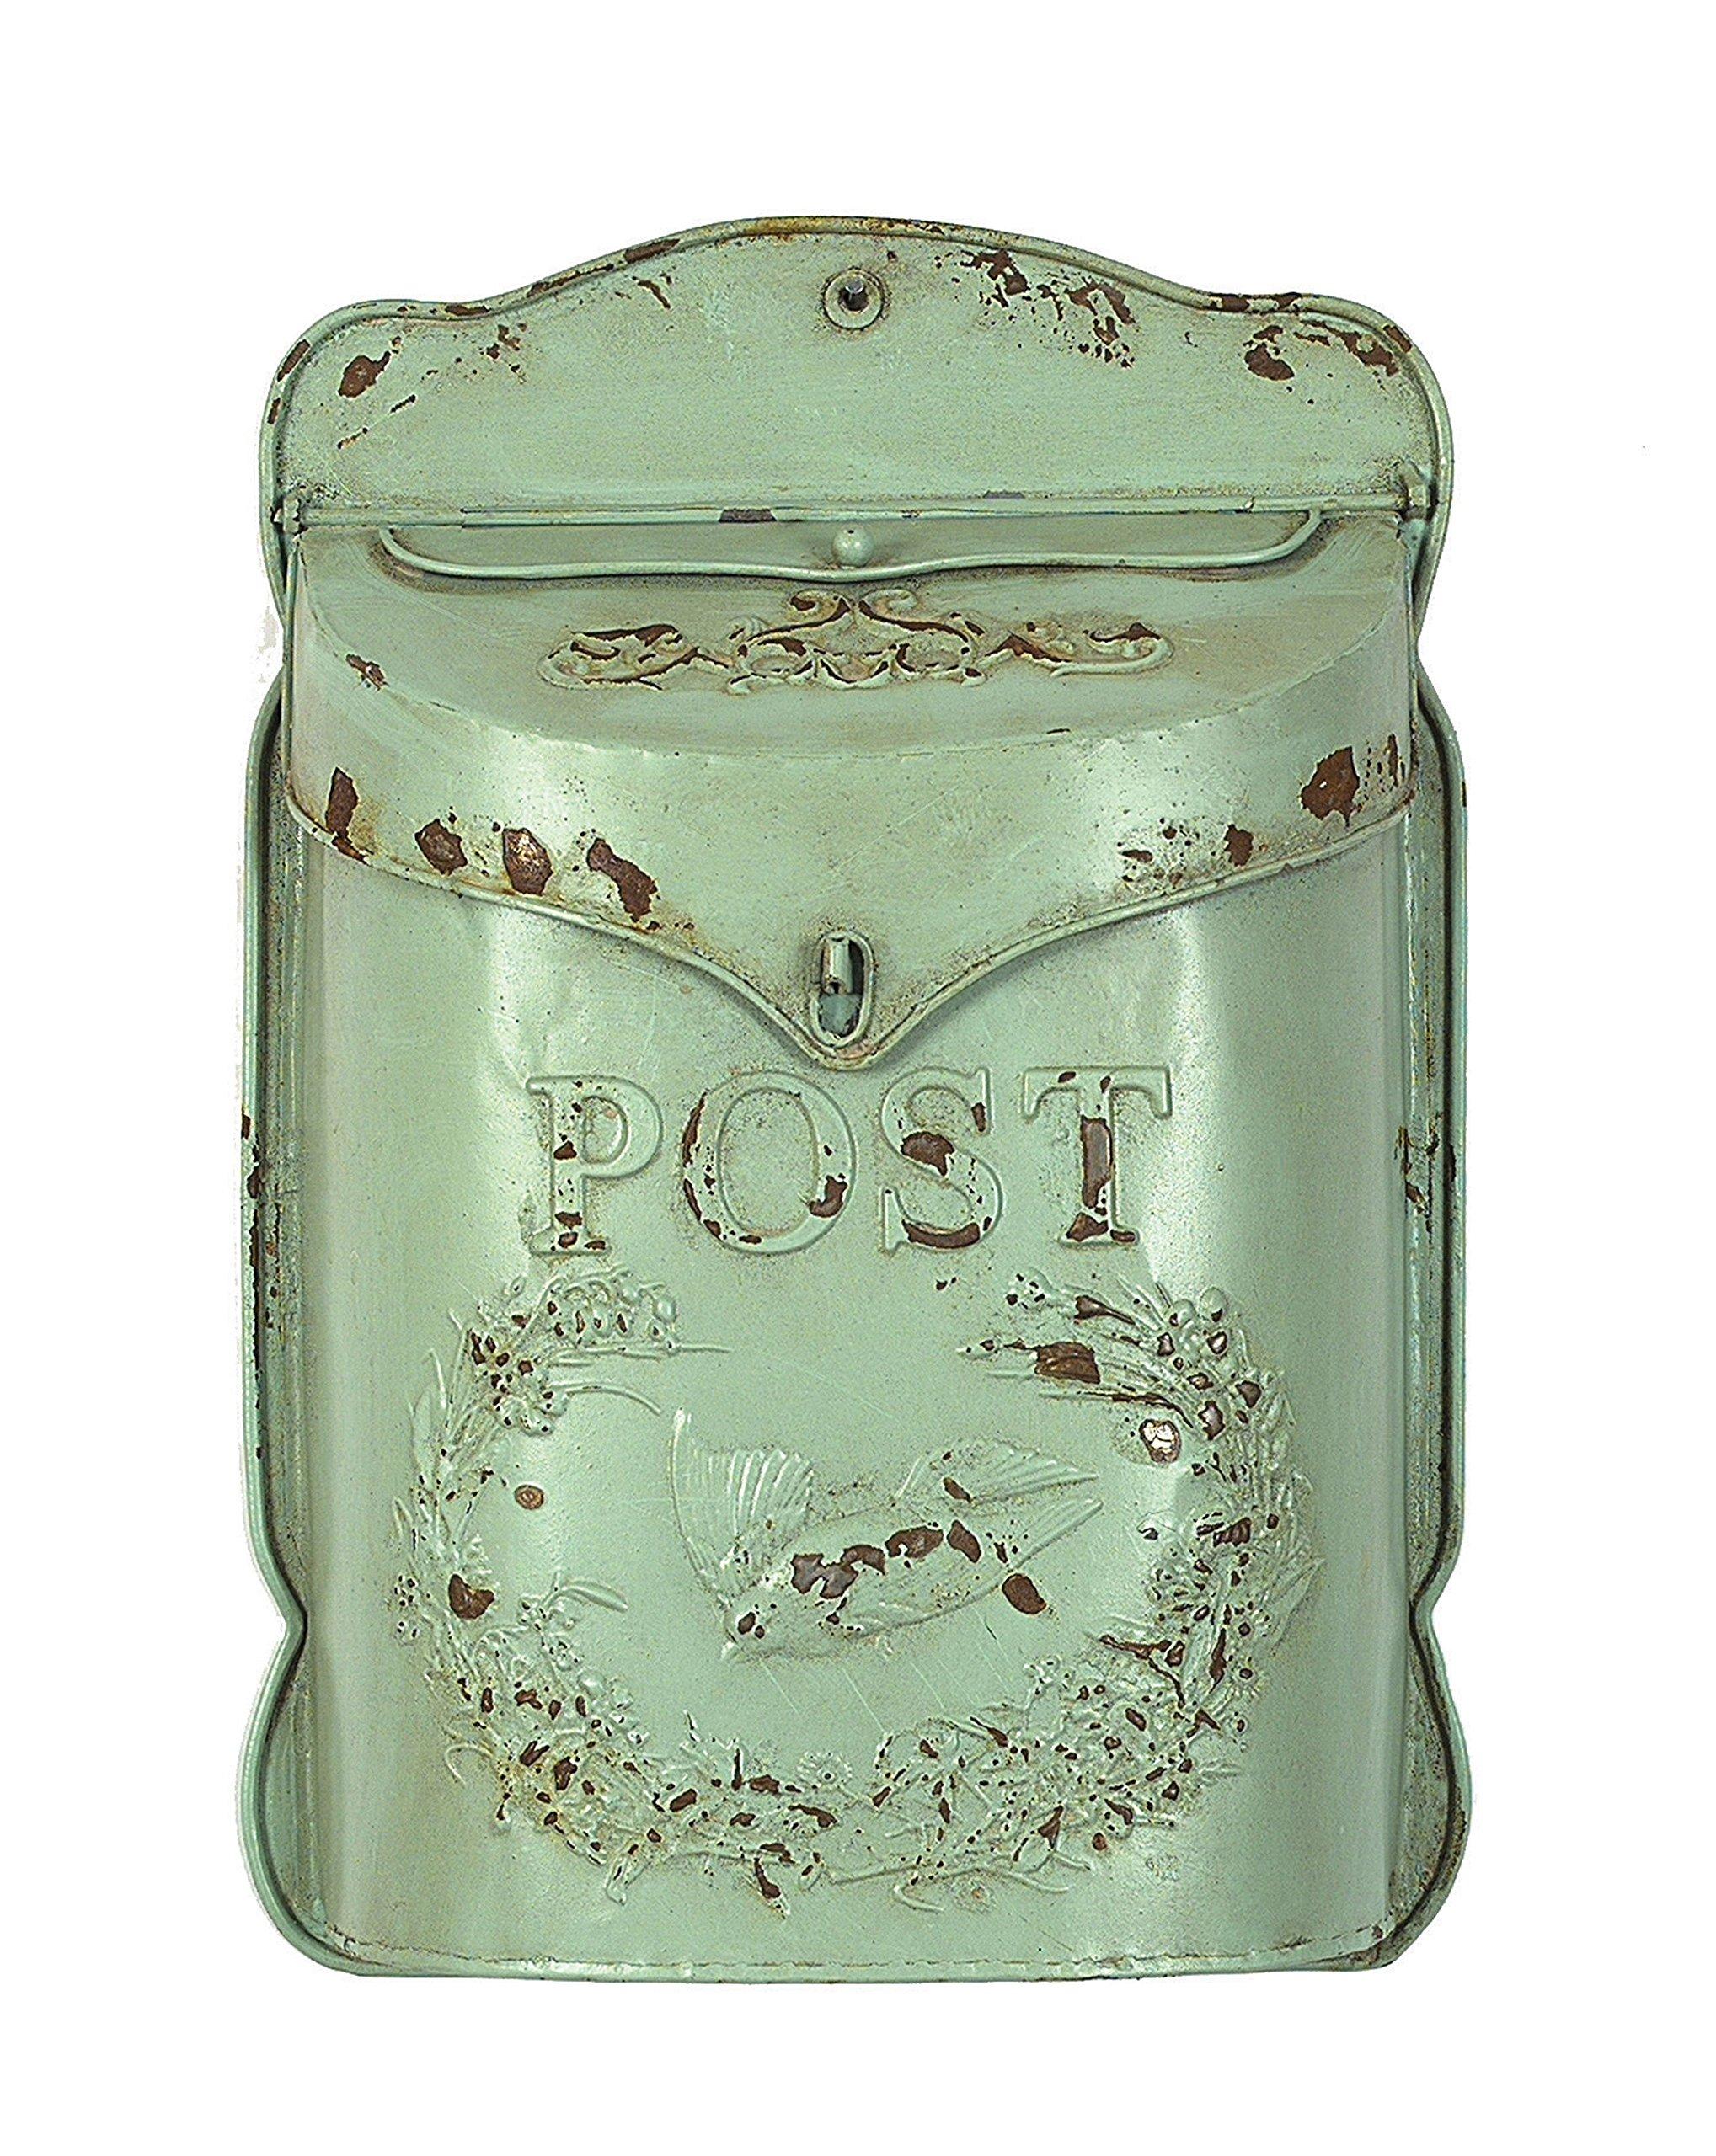 Creative Embossed Tin Letter Box, Aqua - 10.5 x 15.25 Inch